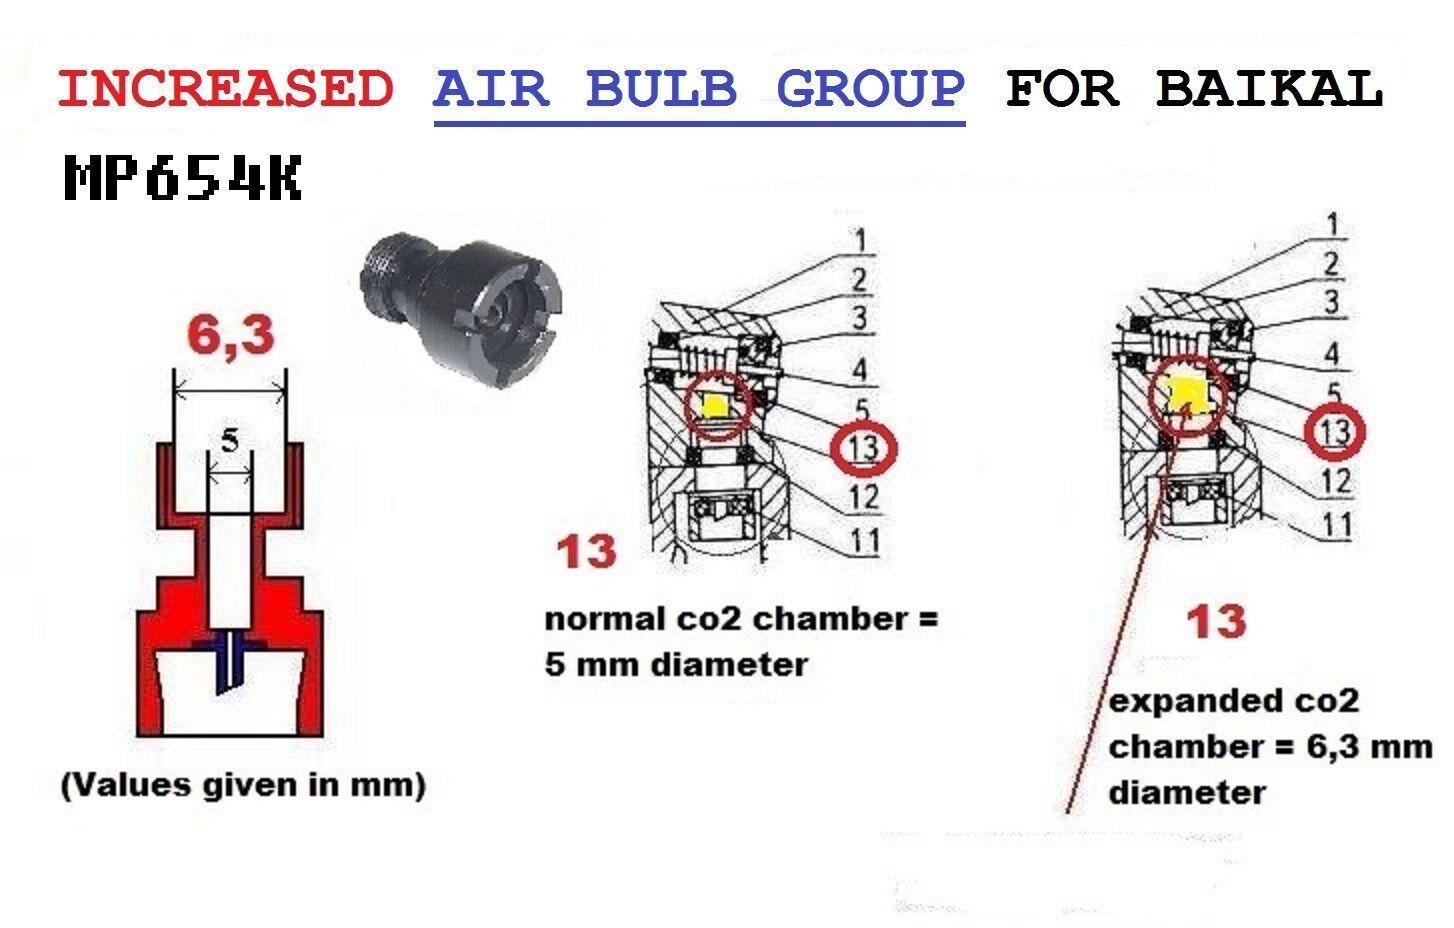 MP654K MAK. TUNING AIR BULB INTERNAL DIAMETER  mm 6,3 - INCH 0,248